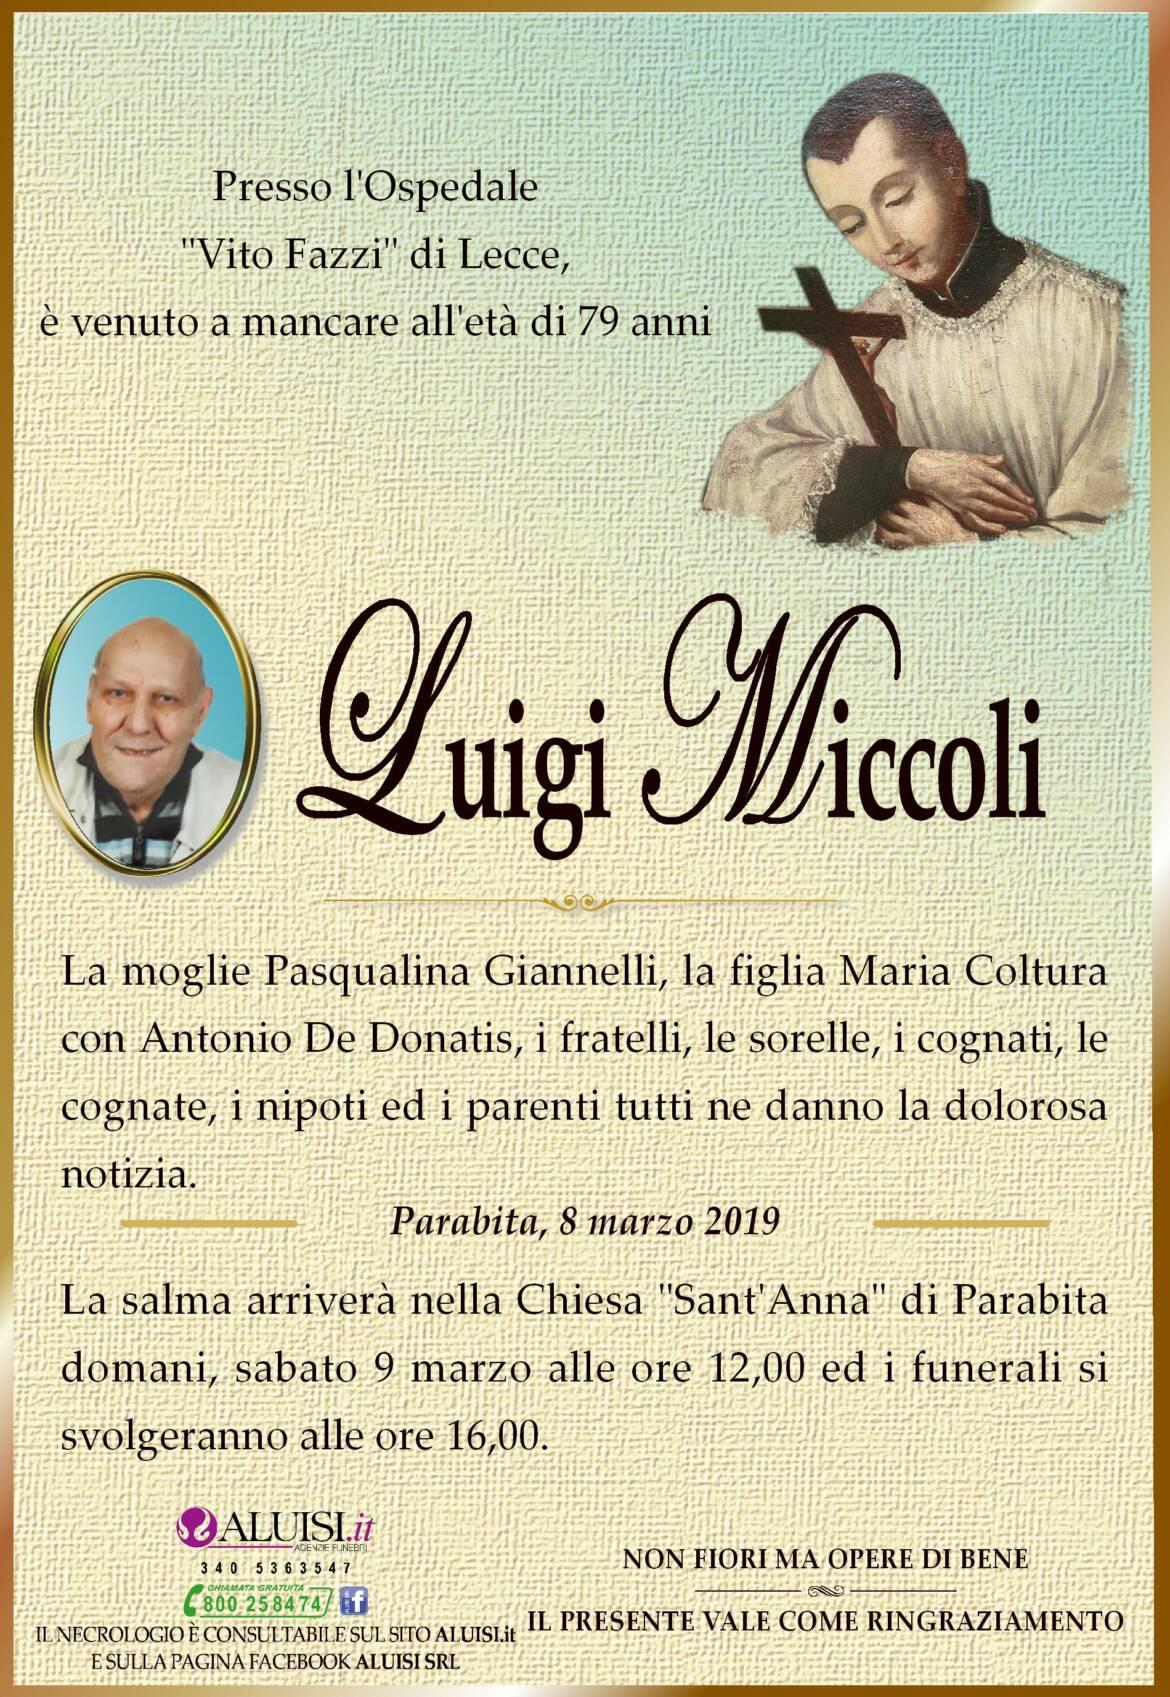 ANN-Luigi-Miccoli-fb.jpg